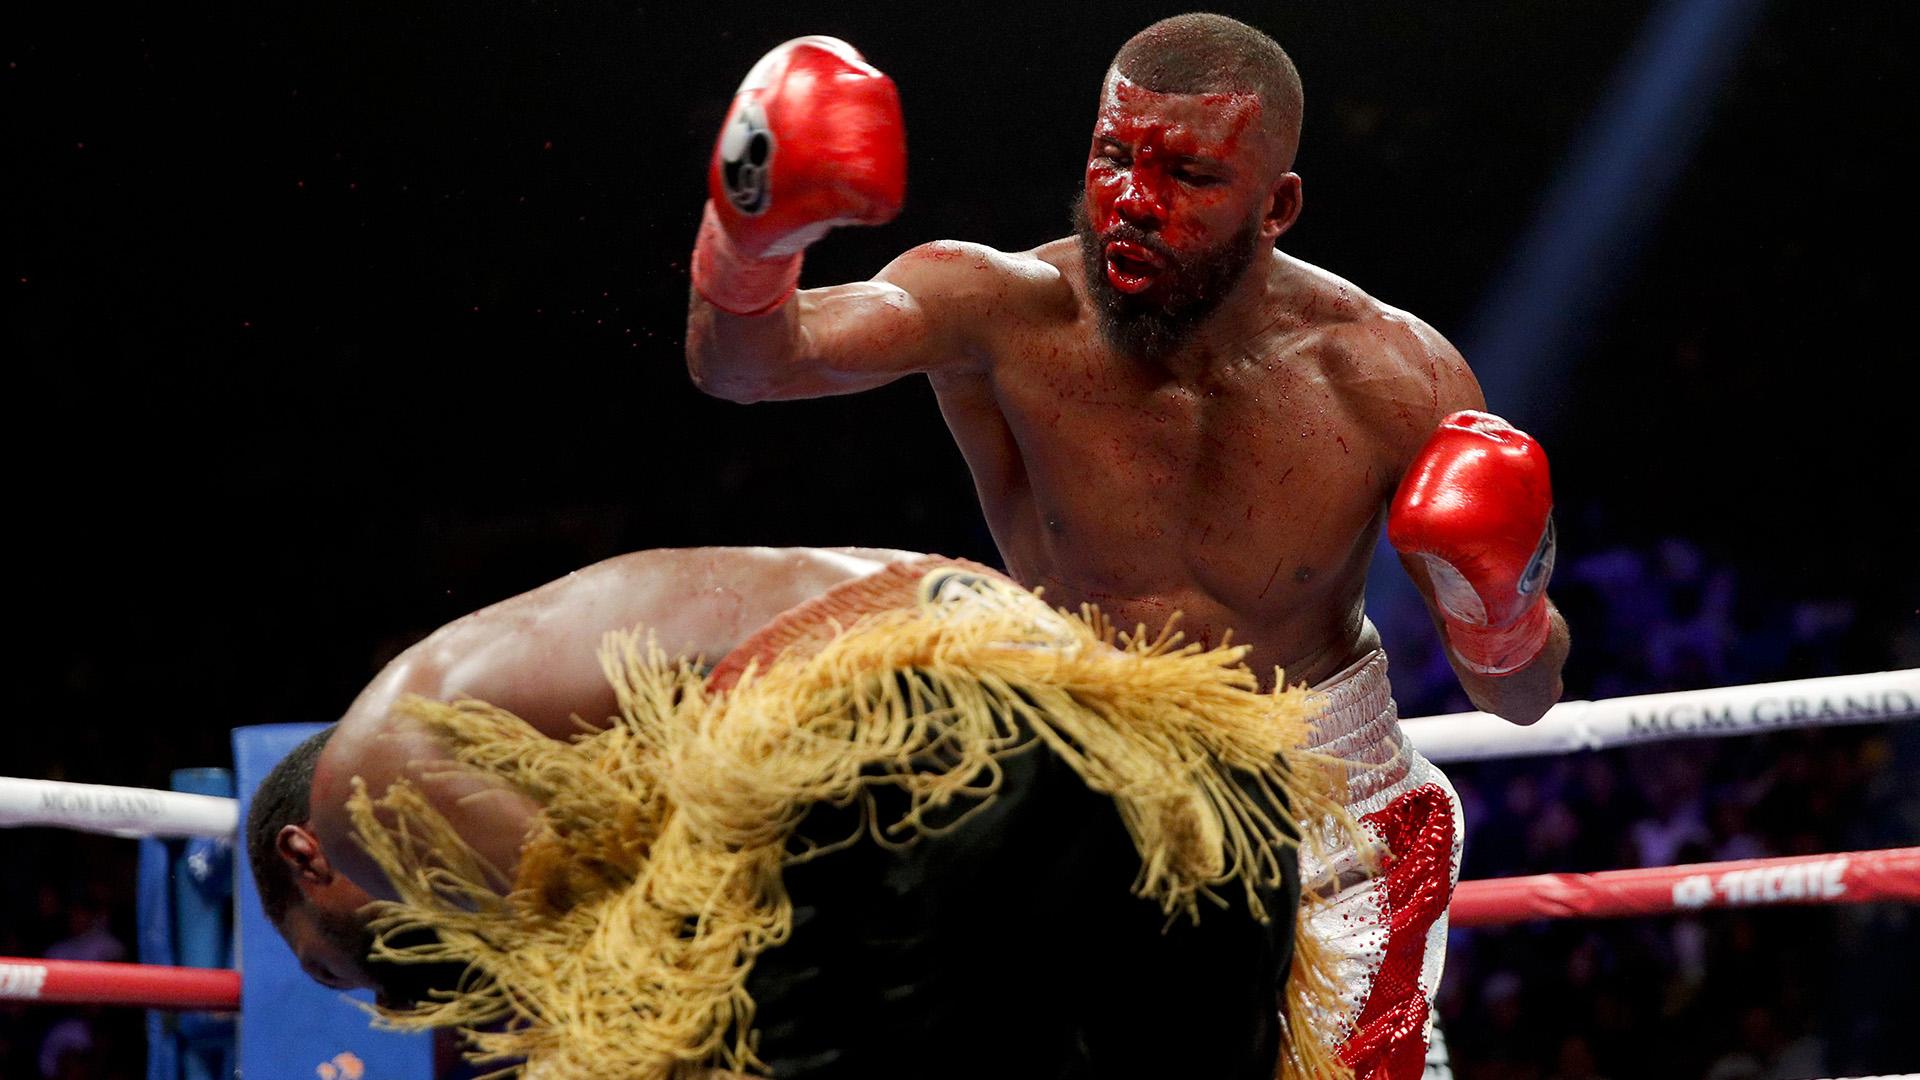 Marcus Browne ducks during his WBA interim light heavyweight boxing bout against Badou Jack on Saturday, Jan. 19, 2019, in Las Vegas. (AP Photo/John Locher)